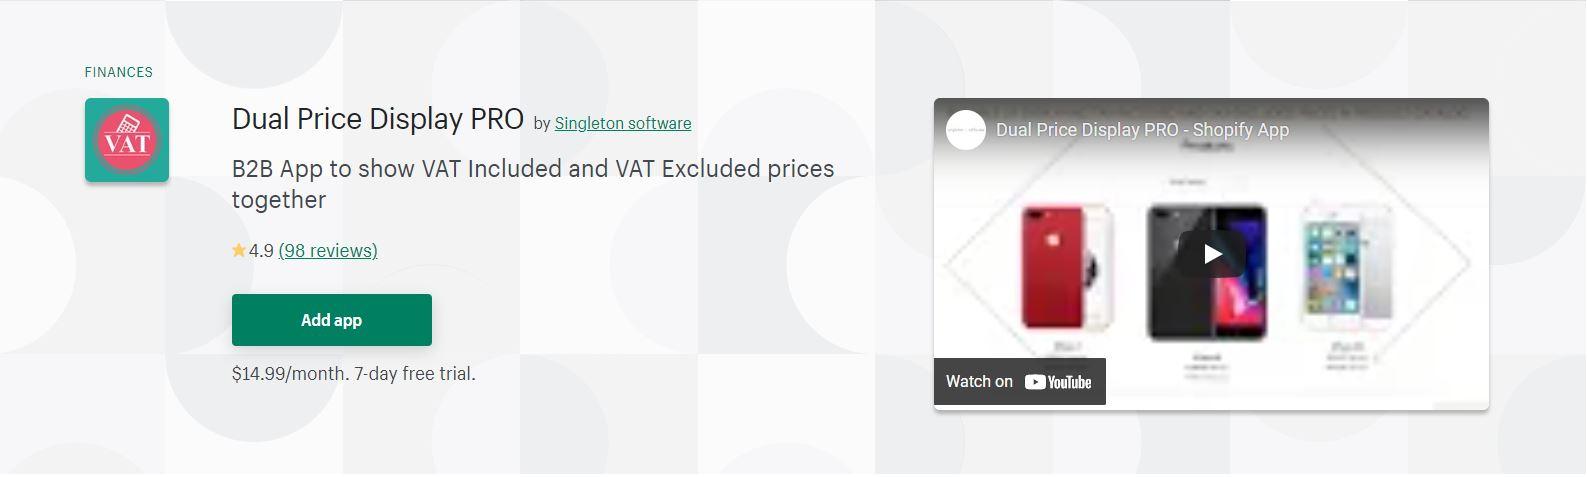 Dual Price Display PRO